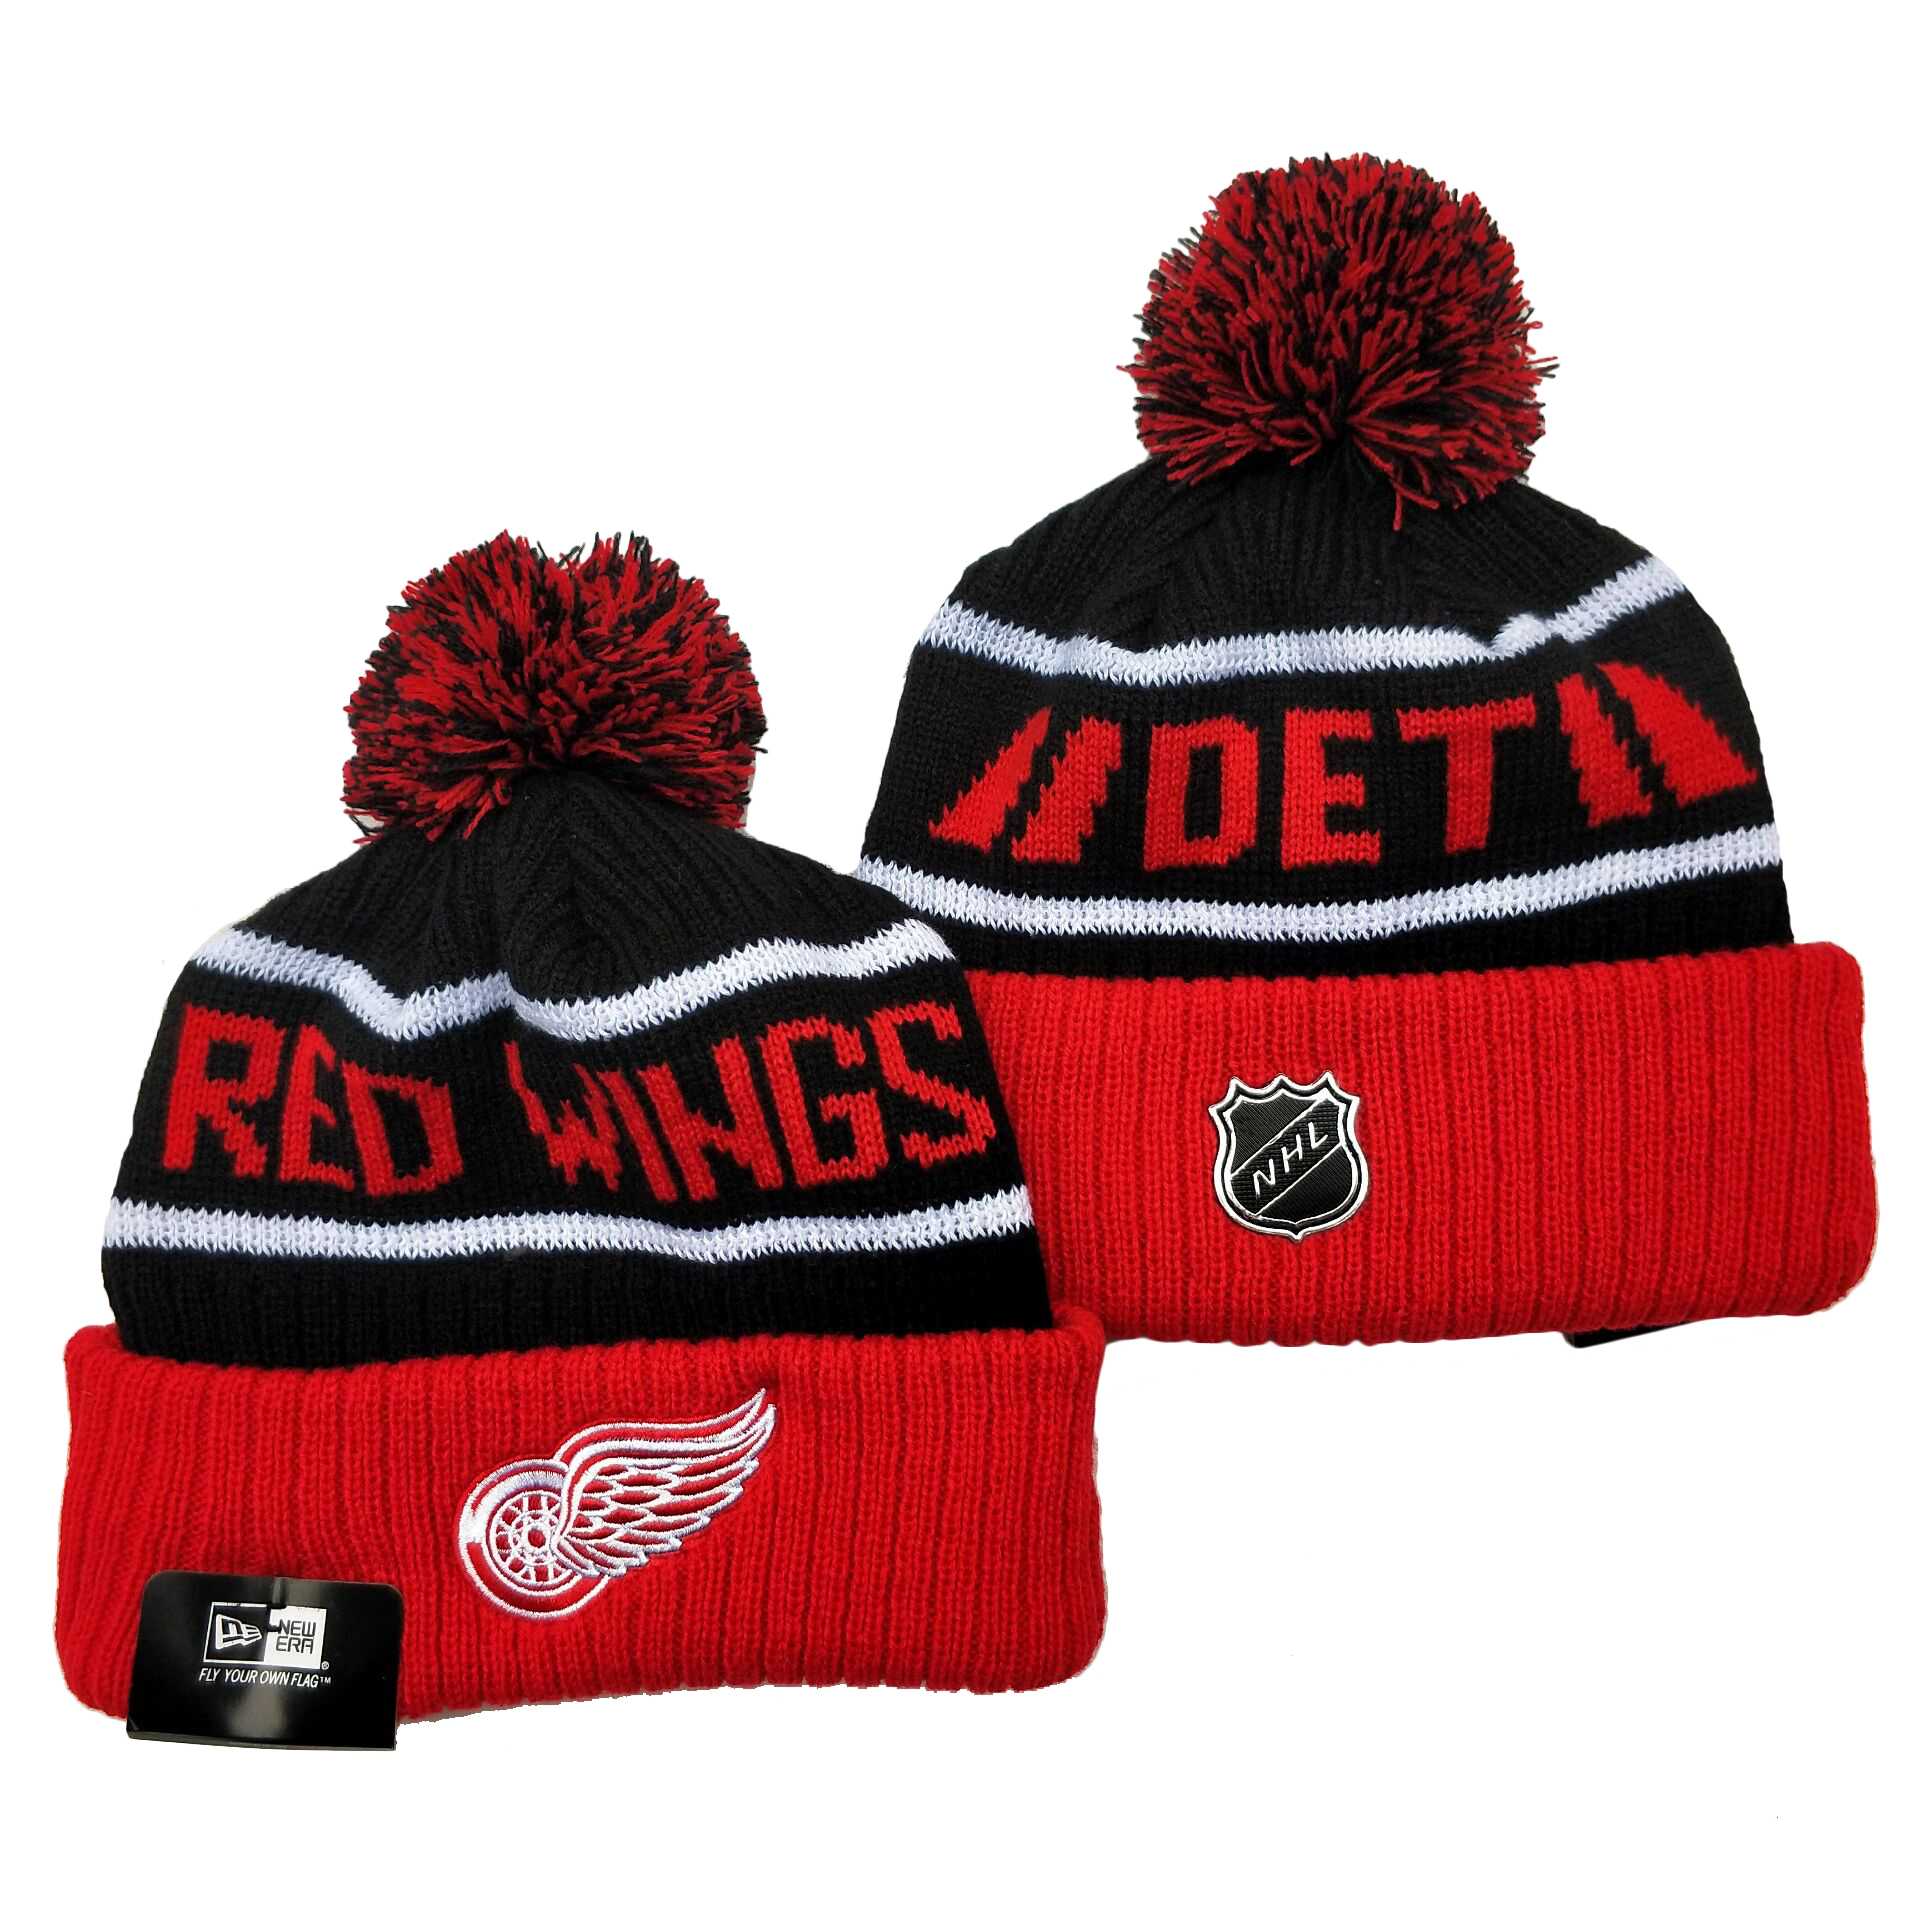 Red Wings Team Logo Red Black Pom Cuffed Knit Hat YD